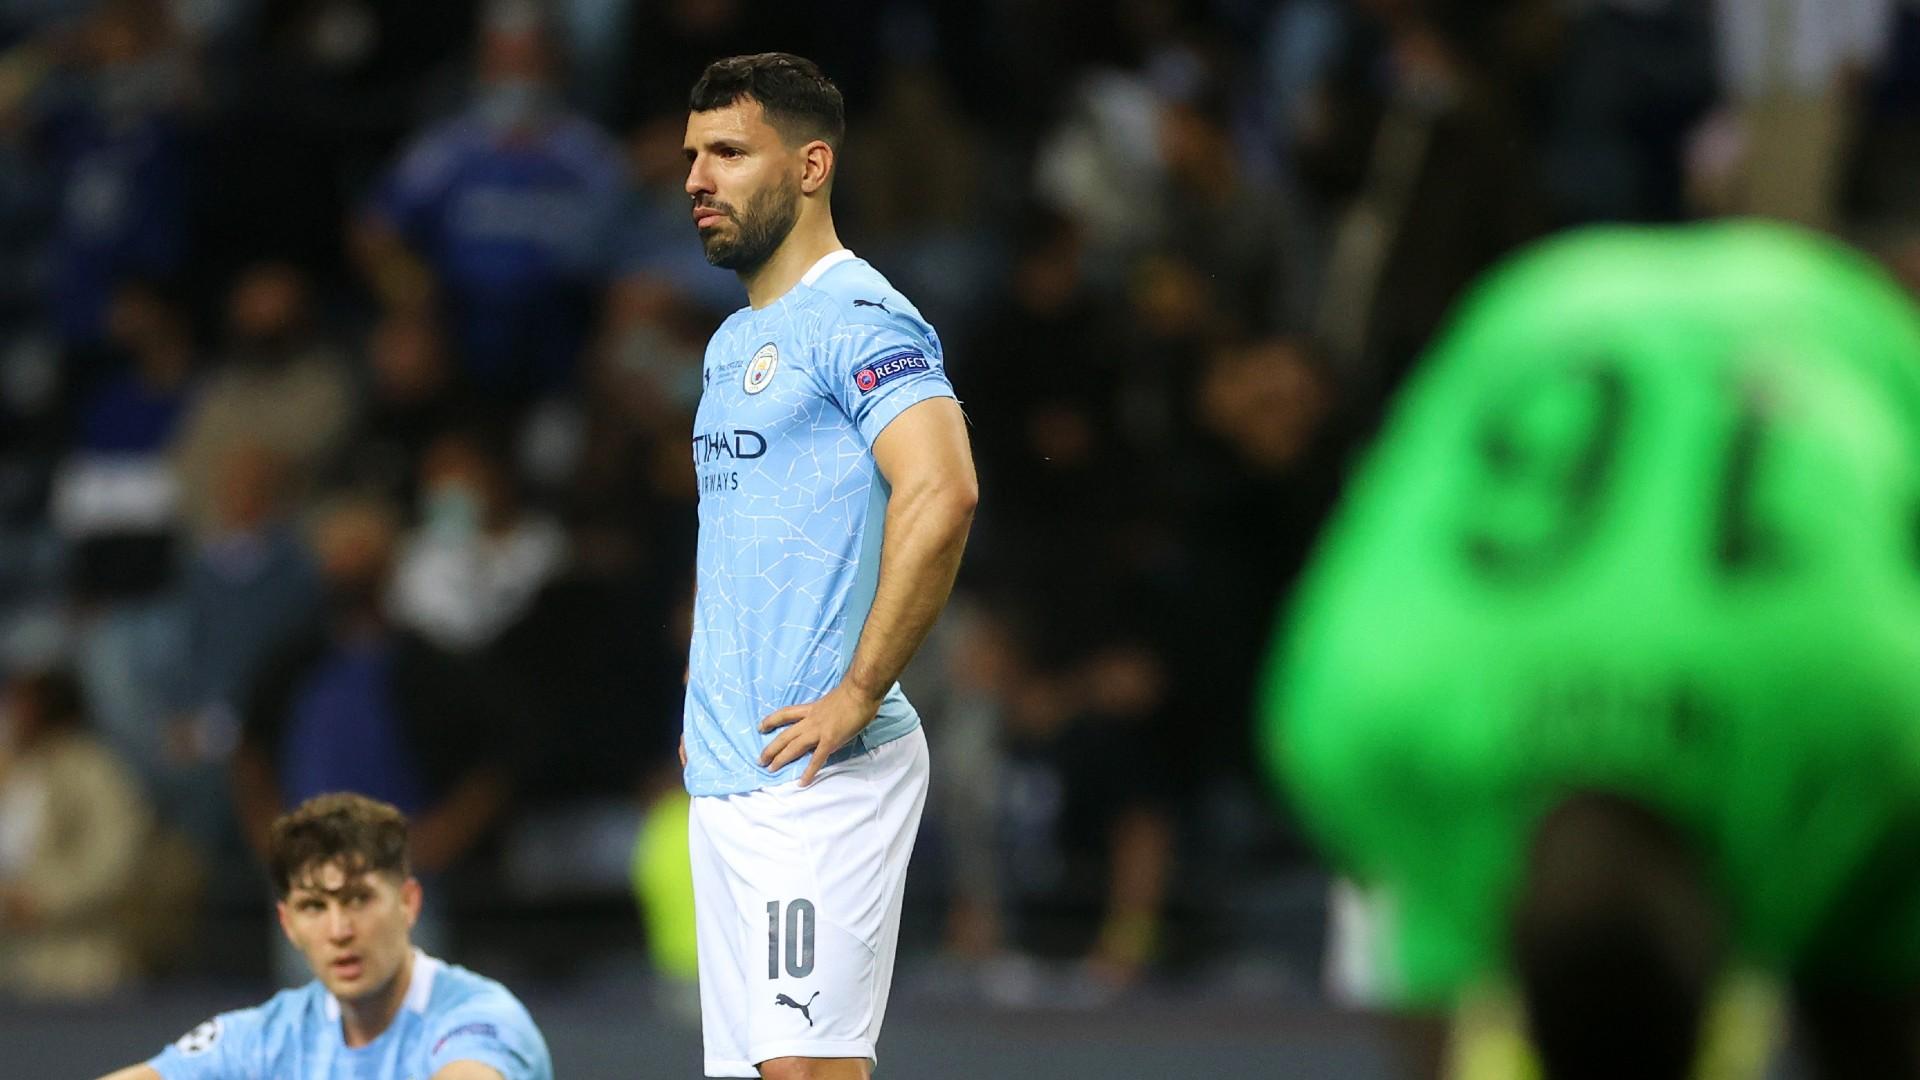 Por qué el Kun Agüero se va del Manchester City? | Goal.com